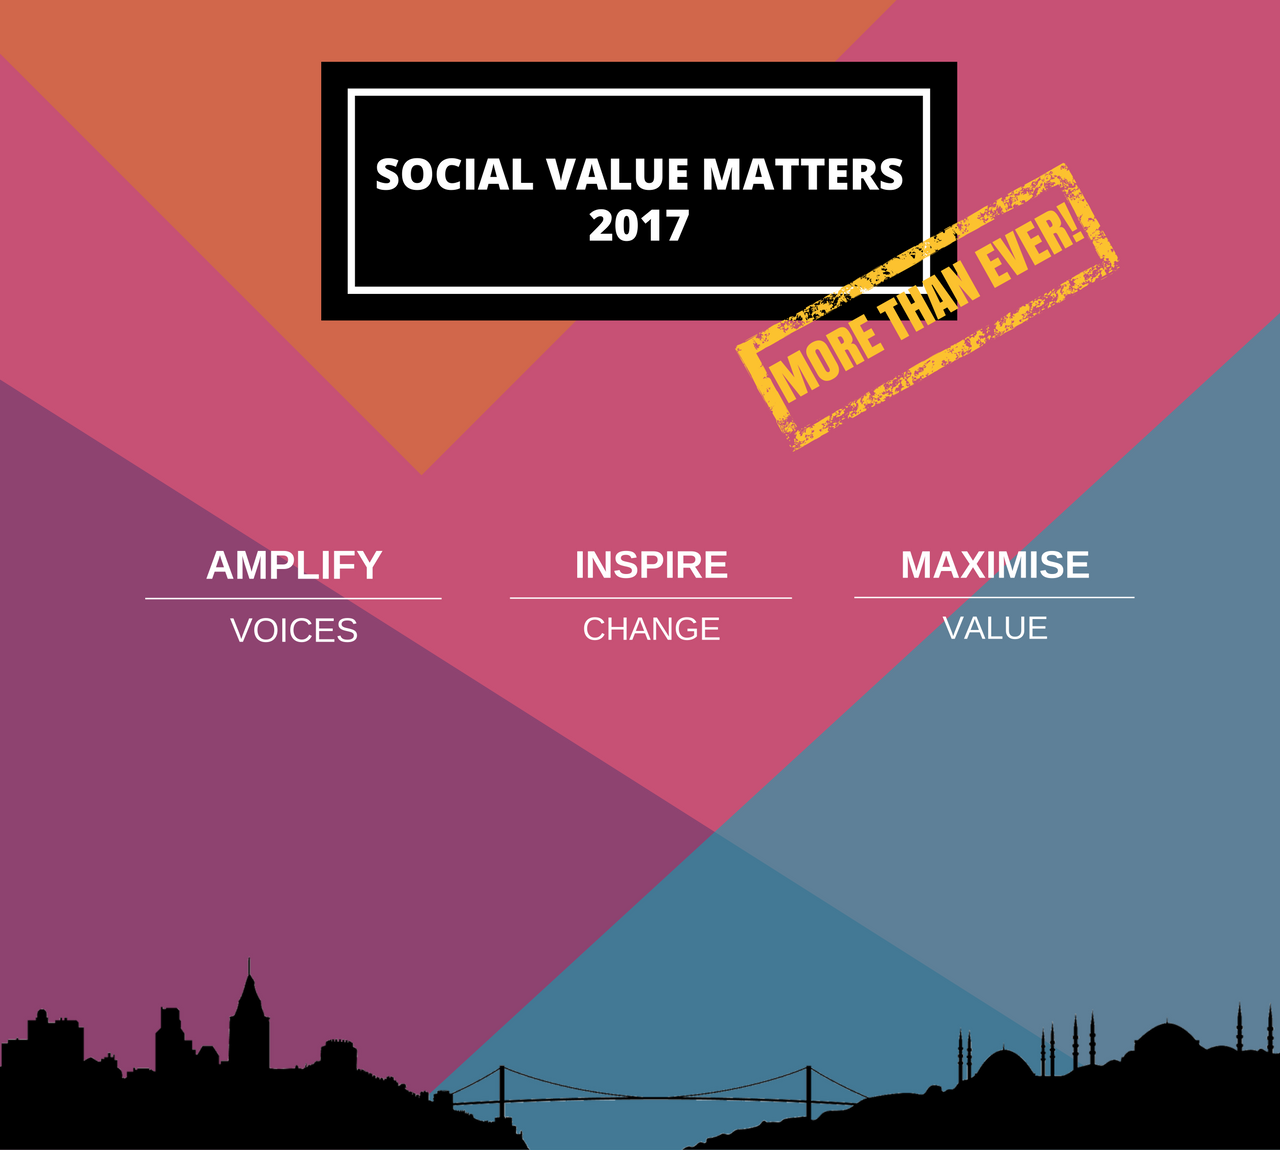 Social Value Matters 2017 programı açıklandı